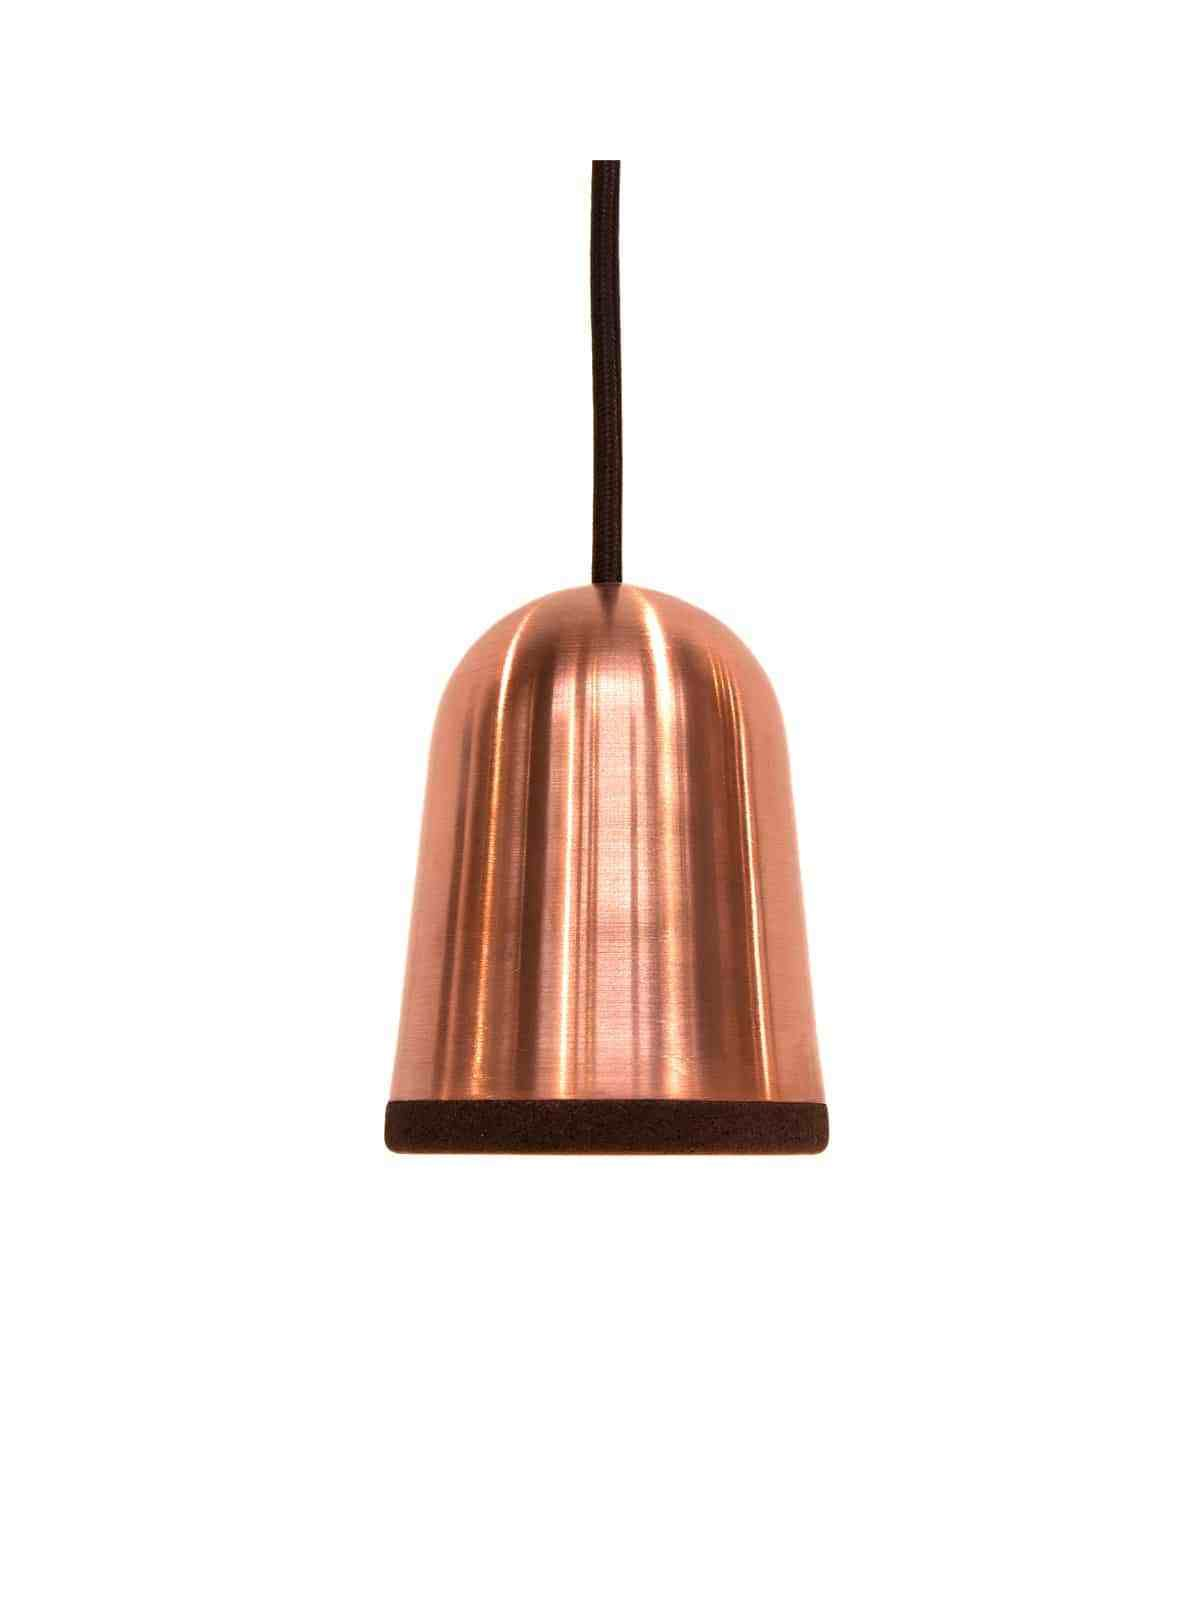 KOJI S Cooper | Kupfer Leuchten | Copper Lamps | Pinterest ...